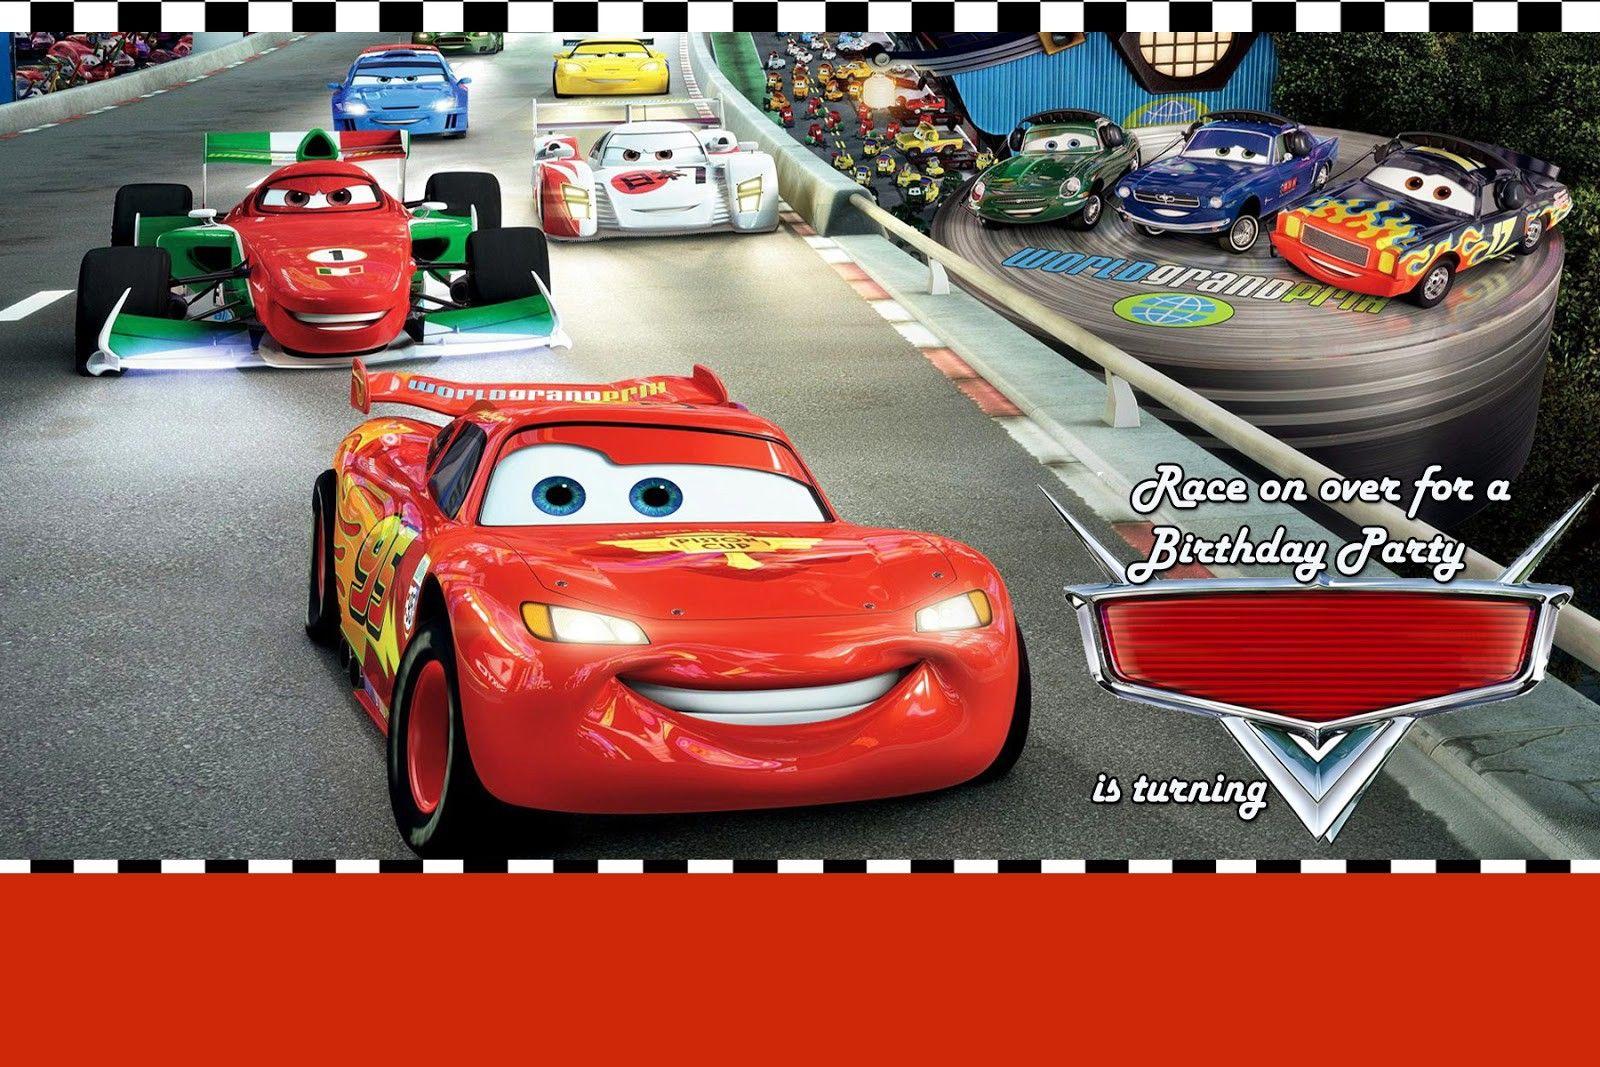 Disney Cars Invitations Templates Free Cars Birthday Invitations Car Birthday Party Invitations Cars Birthday Party Disney